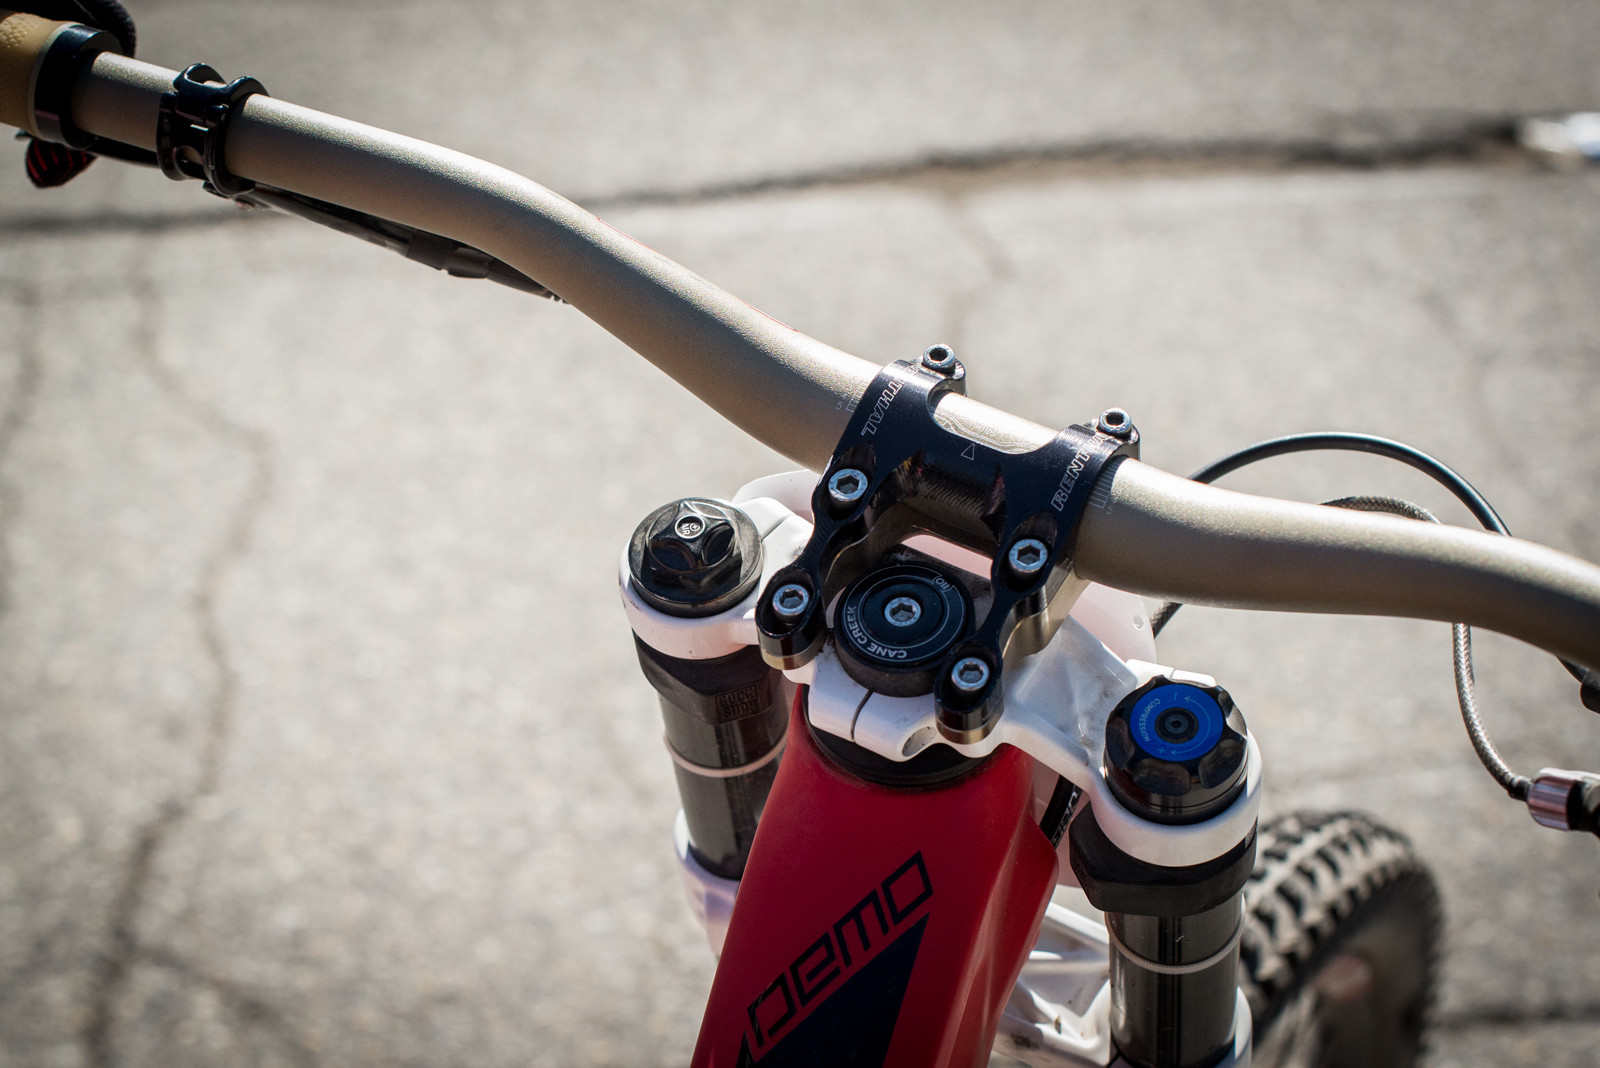 Renthal on Renthal & White BoXXer Crowns - Winning Bike - Mitch Ropelato's Specialized Demo 8 - Mountain Biking Pictures - Vital MTB